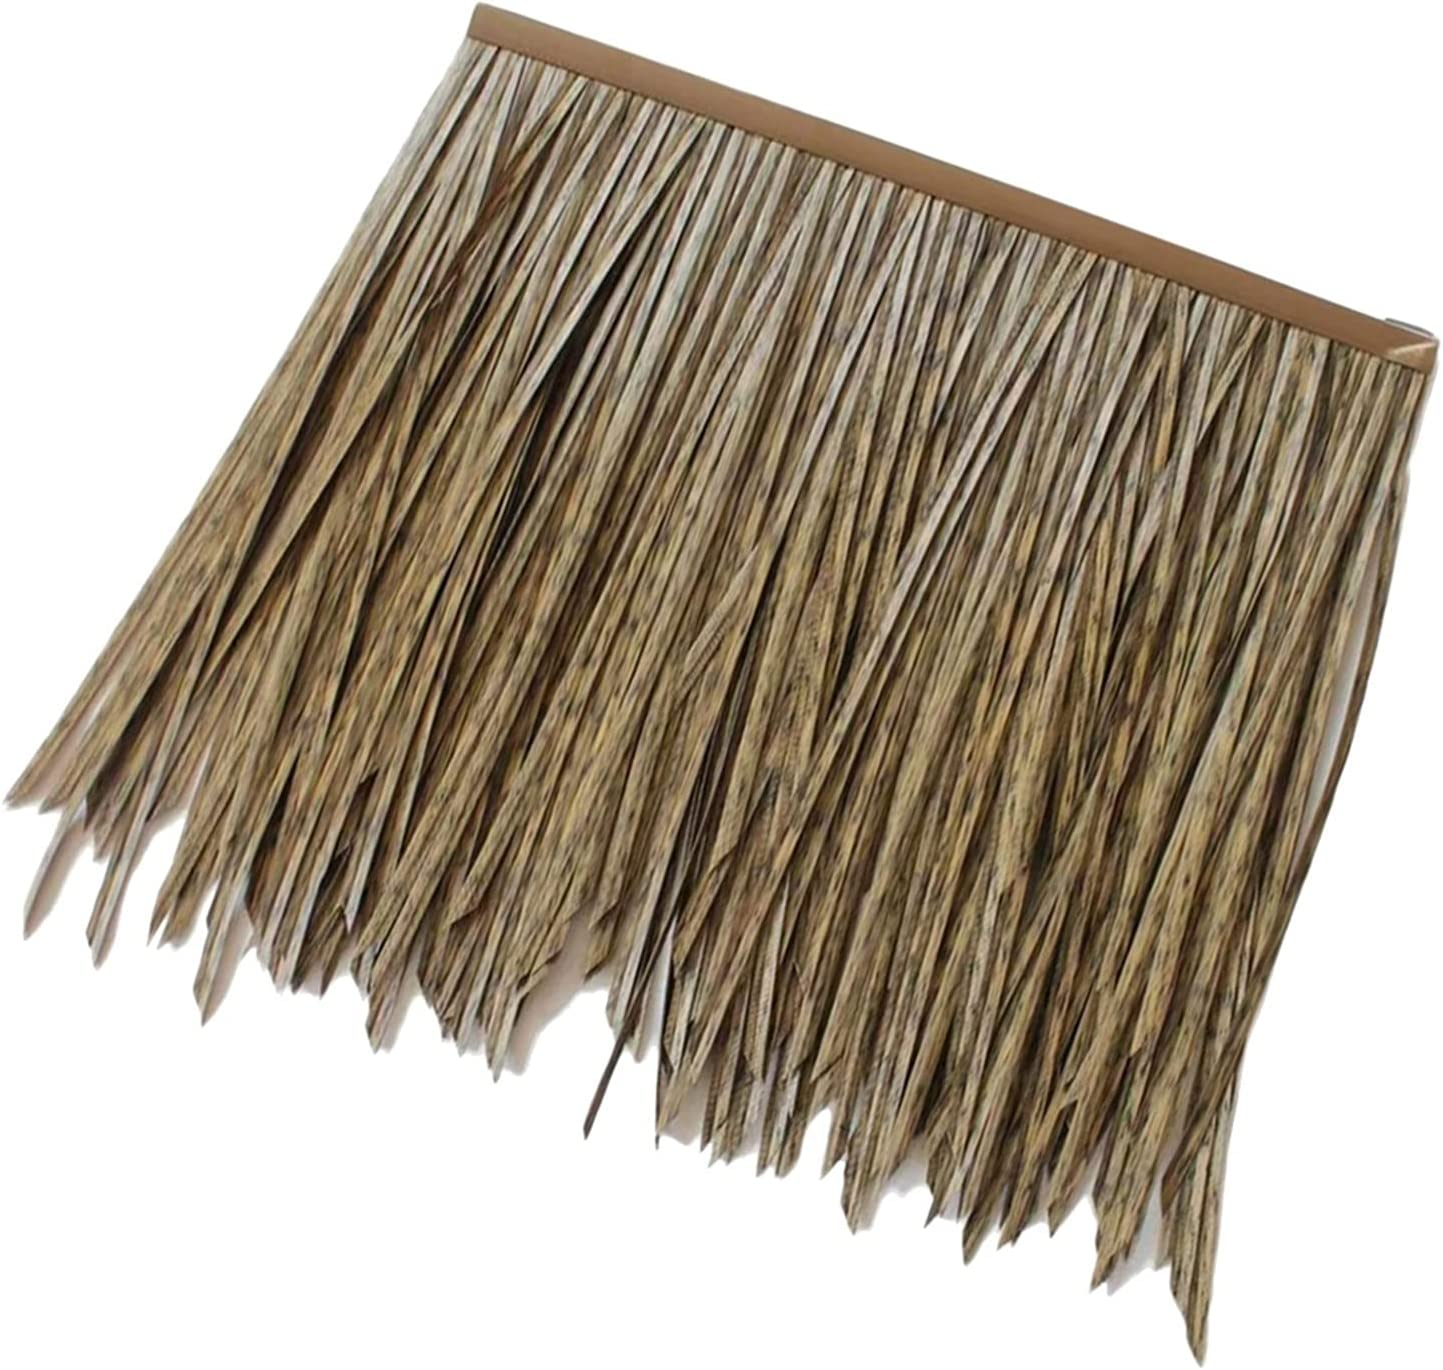 Artificial Thatch Tile Fake Straw PVC Omaha Finally resale start Mall PE Fur Plastic Umb